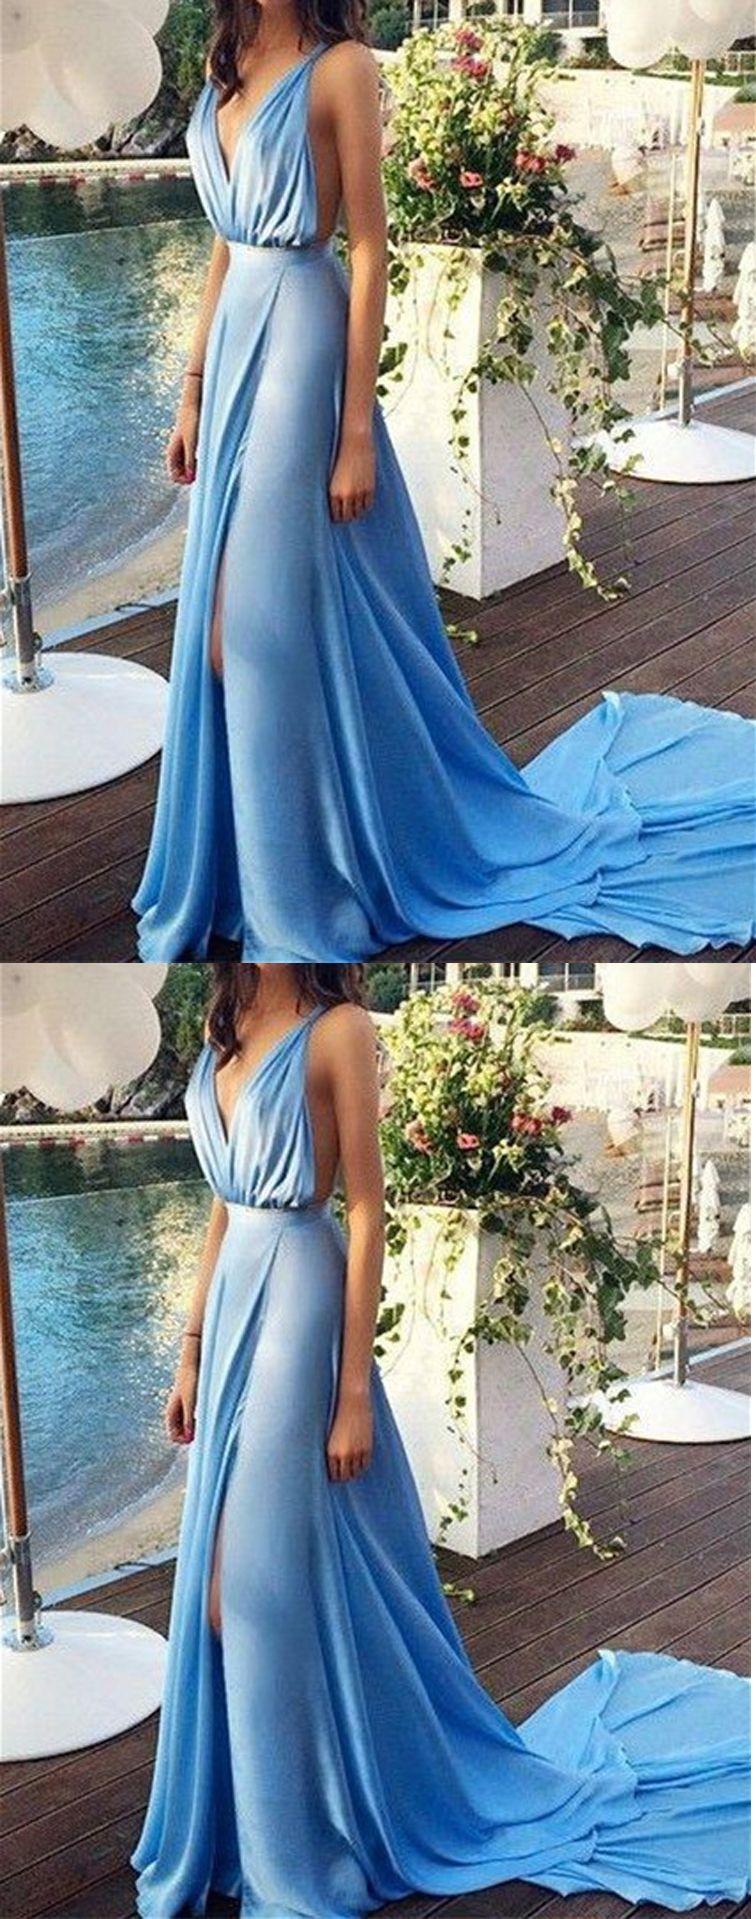 Blue Prom Dresses,Chiffon Evening Dress,Long Prom Gowns,V-Neck Prom ...